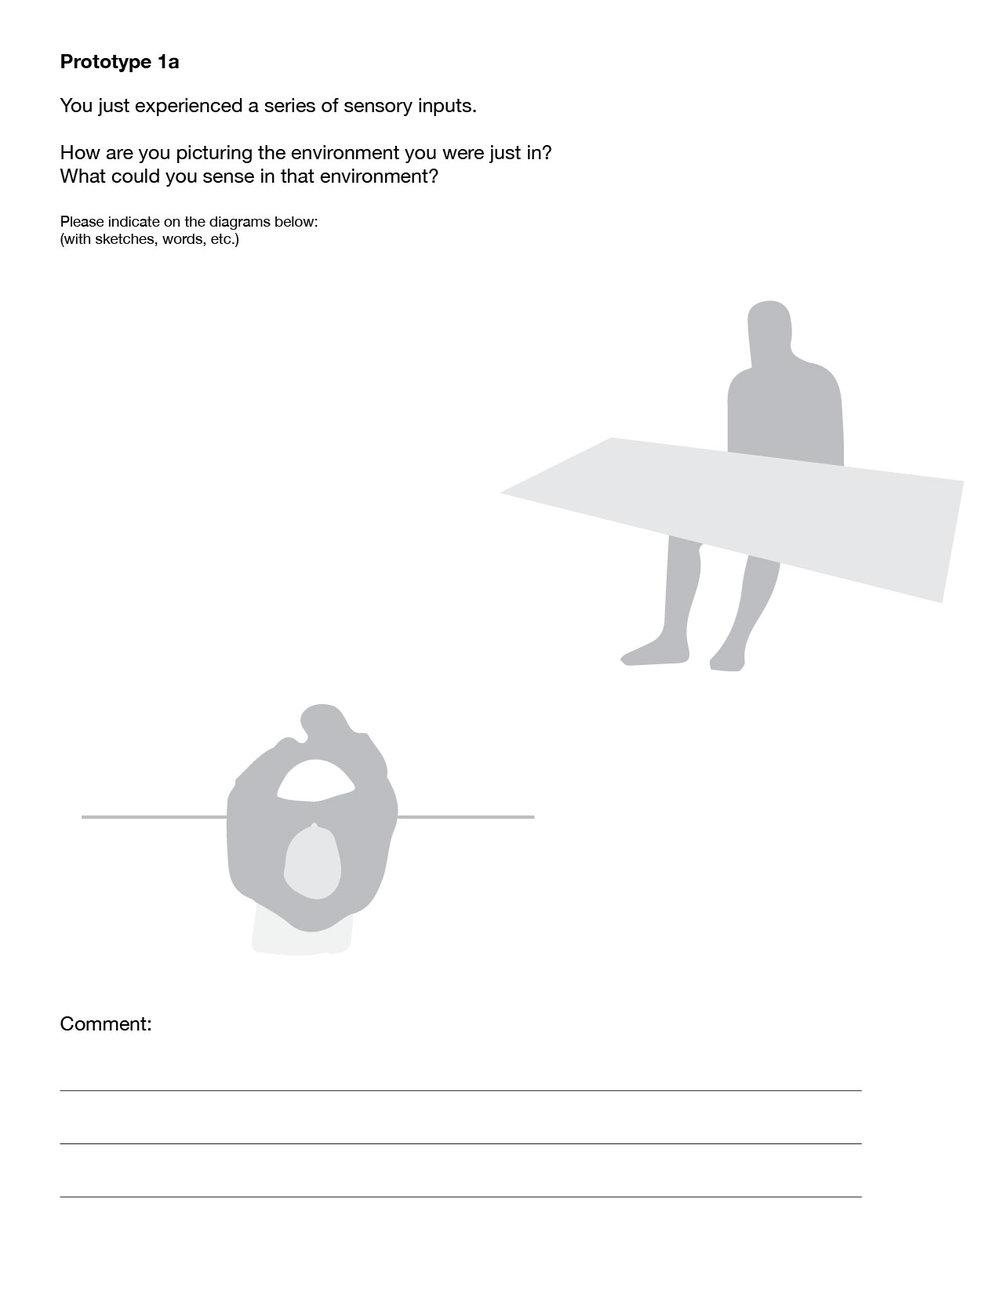 prototype1_questionnaire-01.jpg